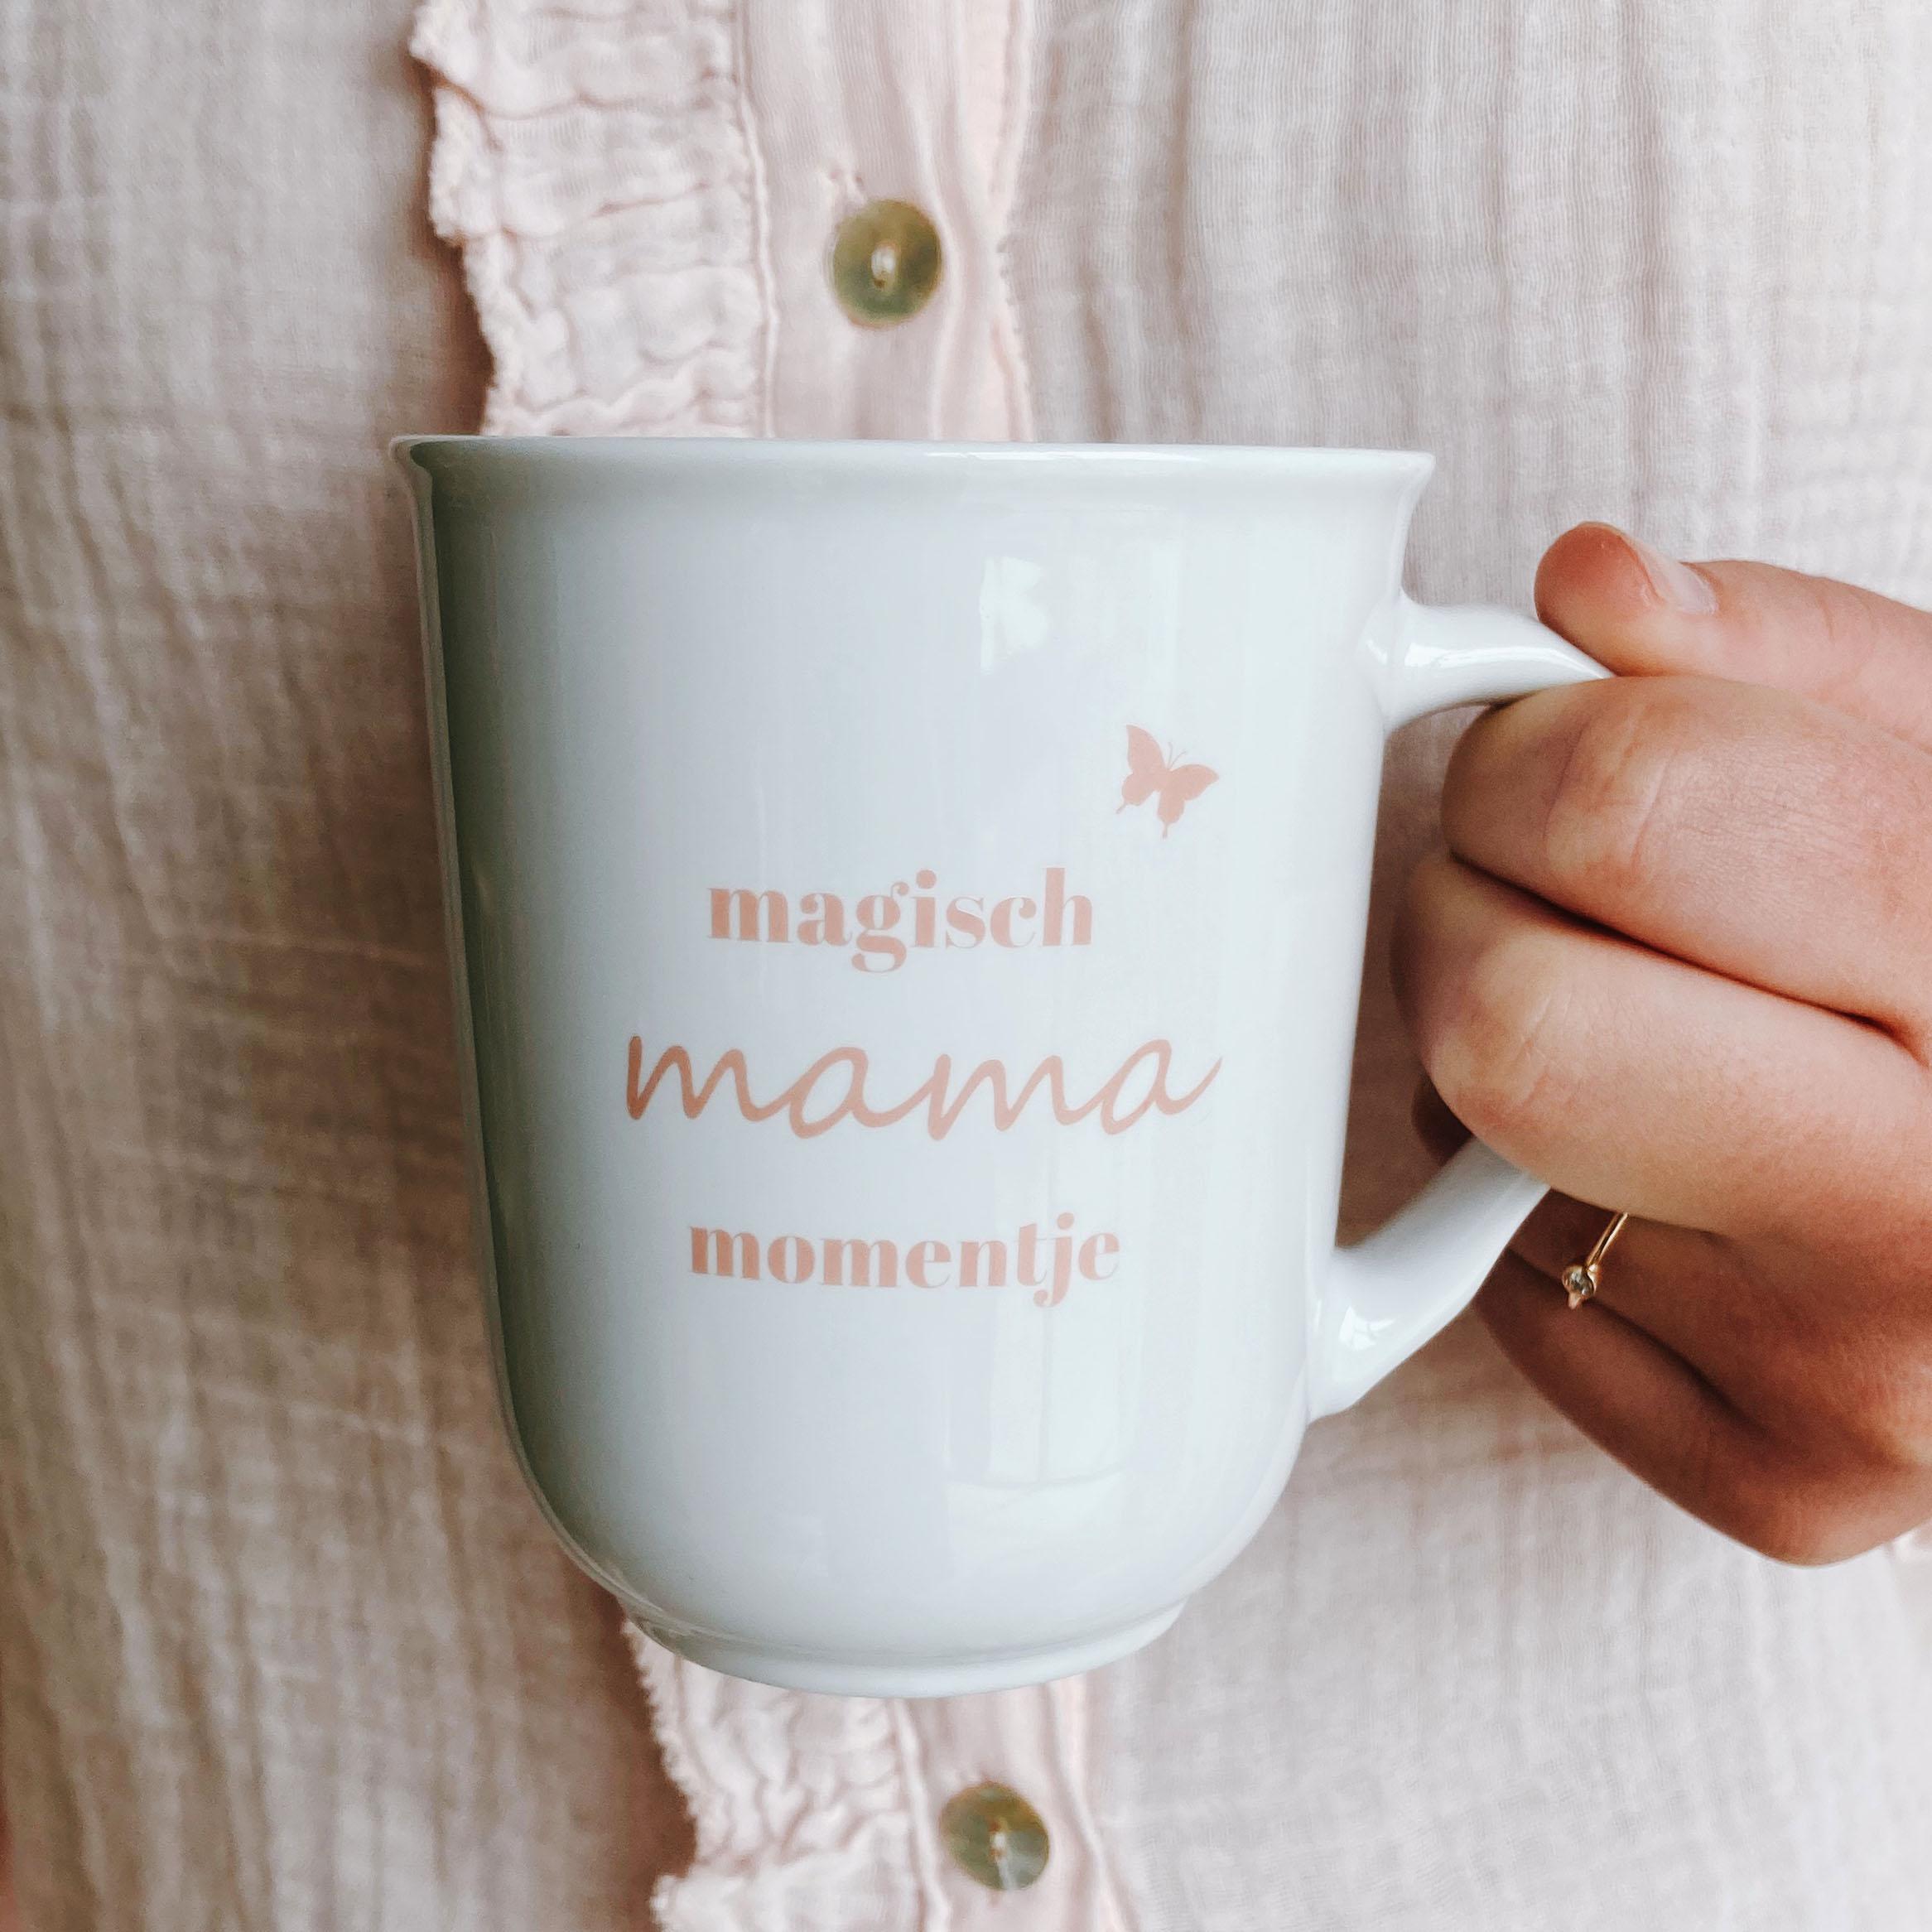 Mok moederdag onder mama's magisch mama momentje